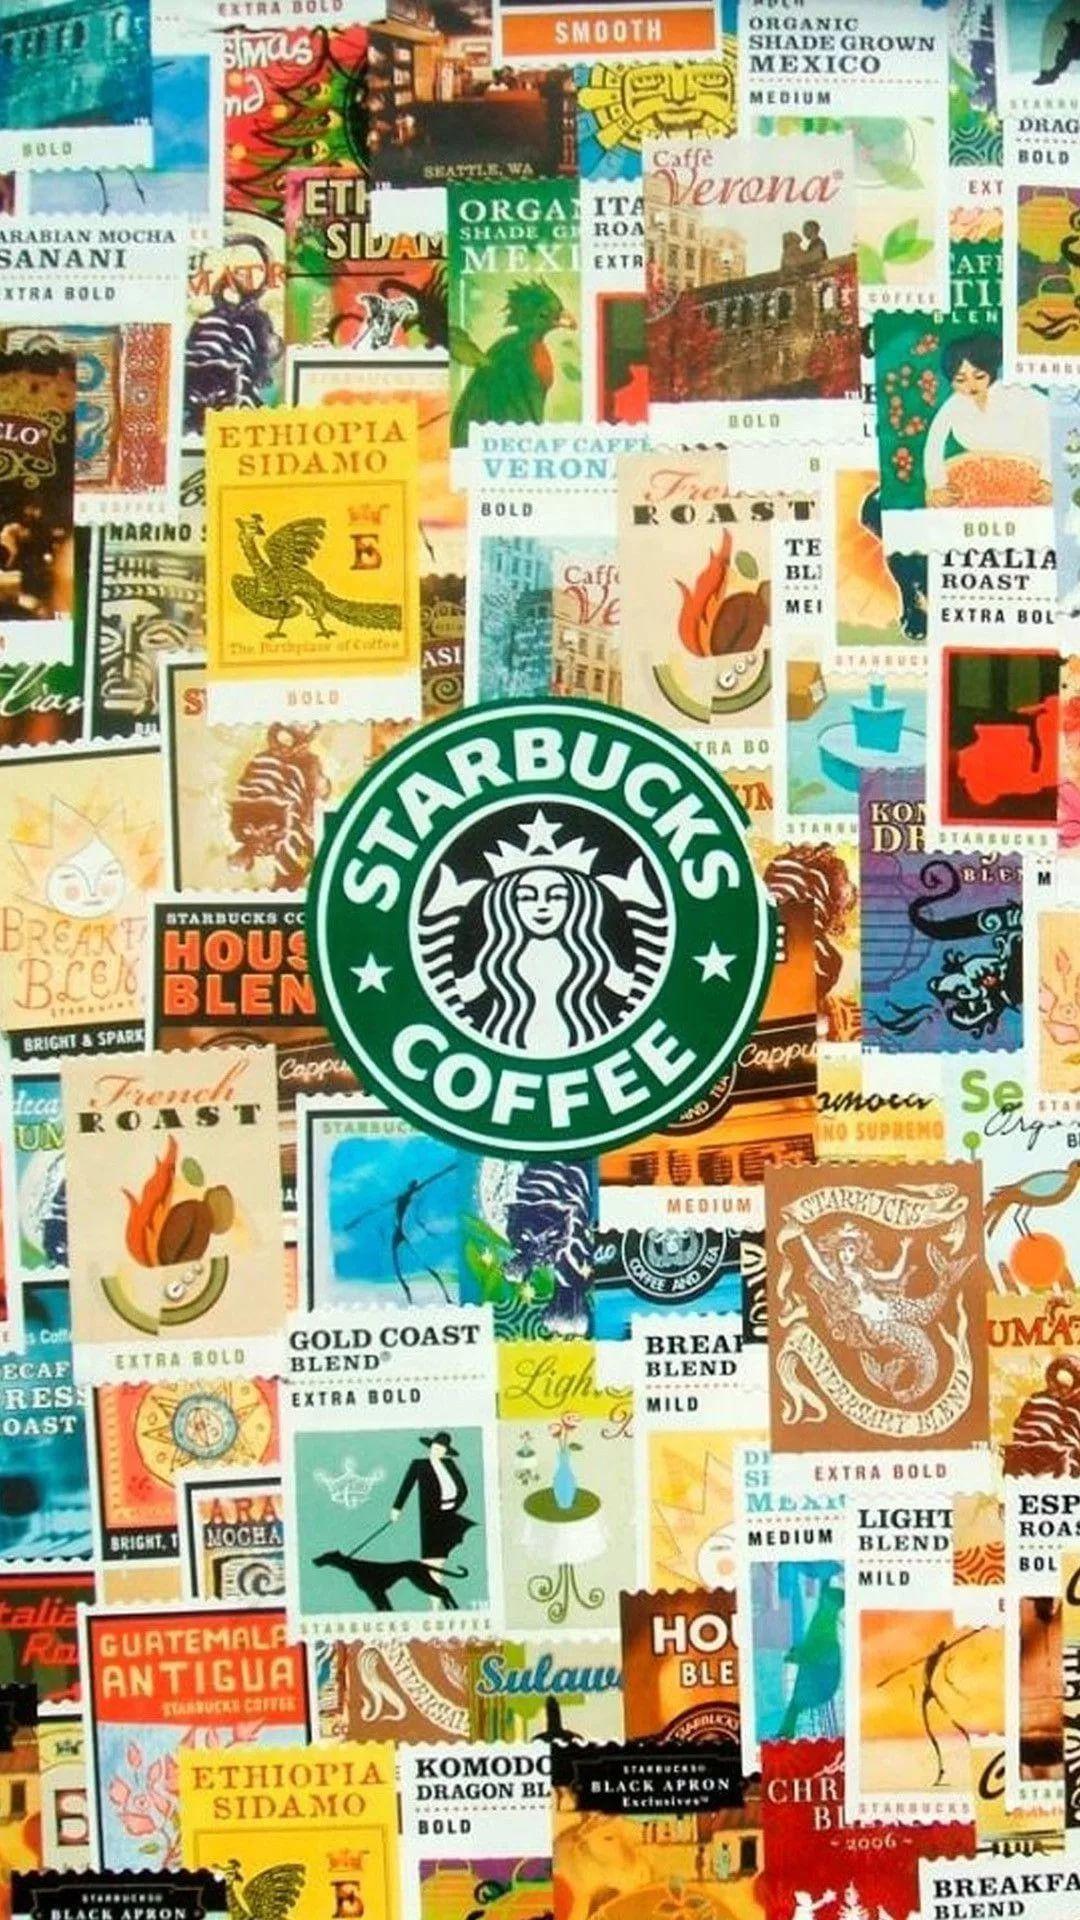 Starbucks iPhone 8 wallpaper